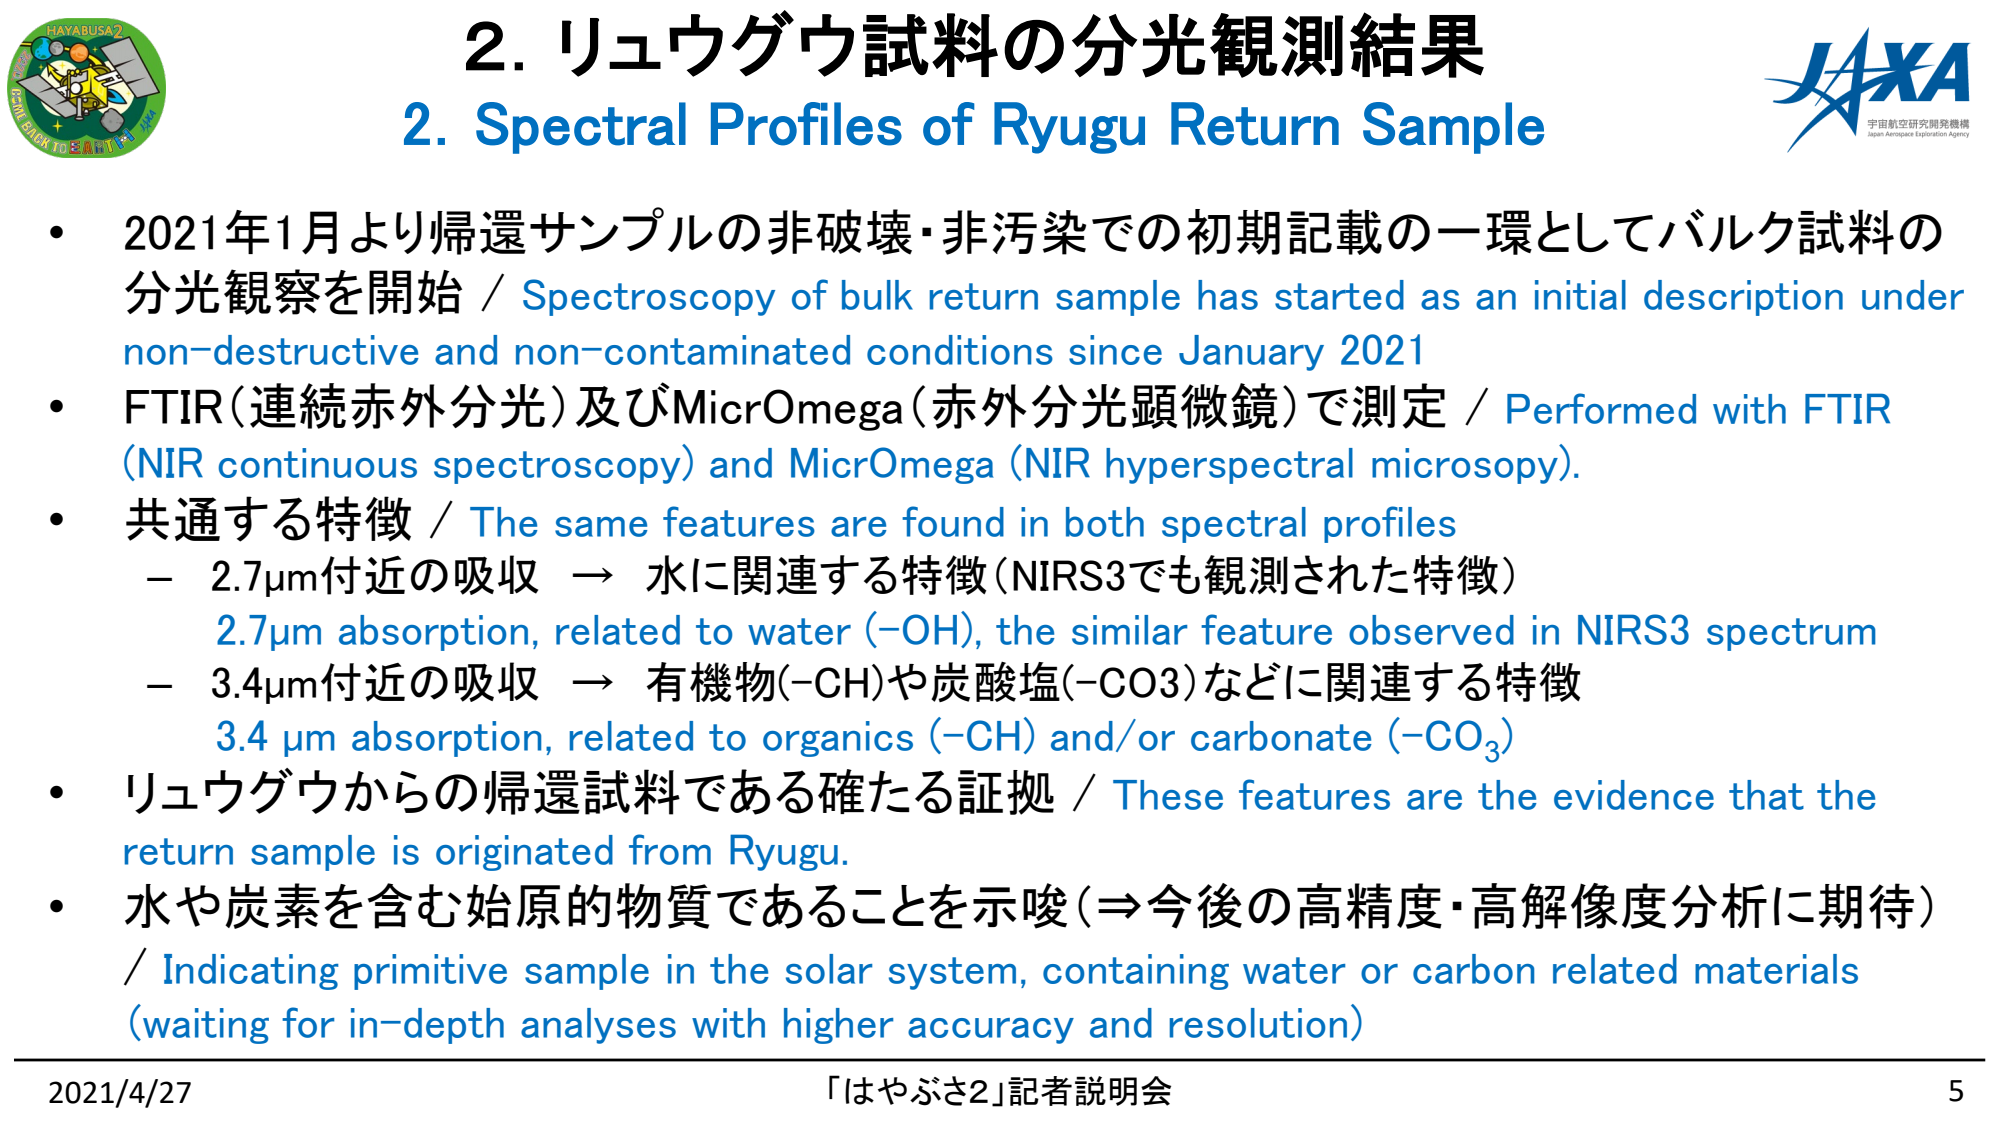 f:id:Imamura:20210427135115p:plain